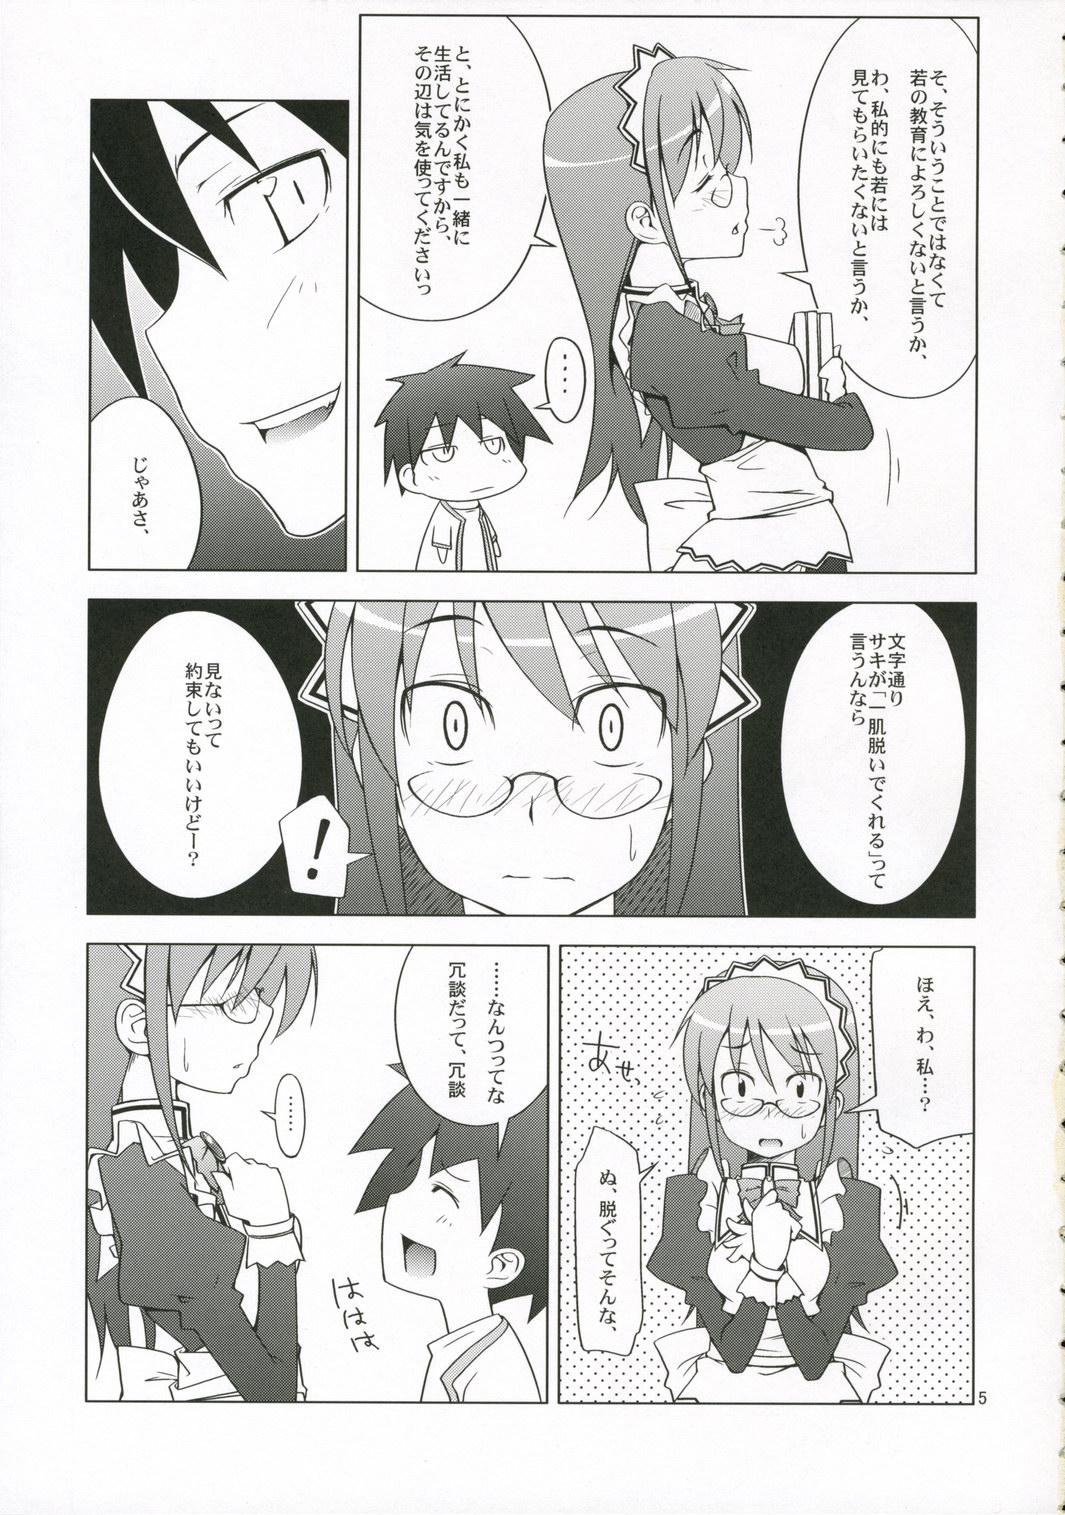 Sakittyo Shoukougun 3